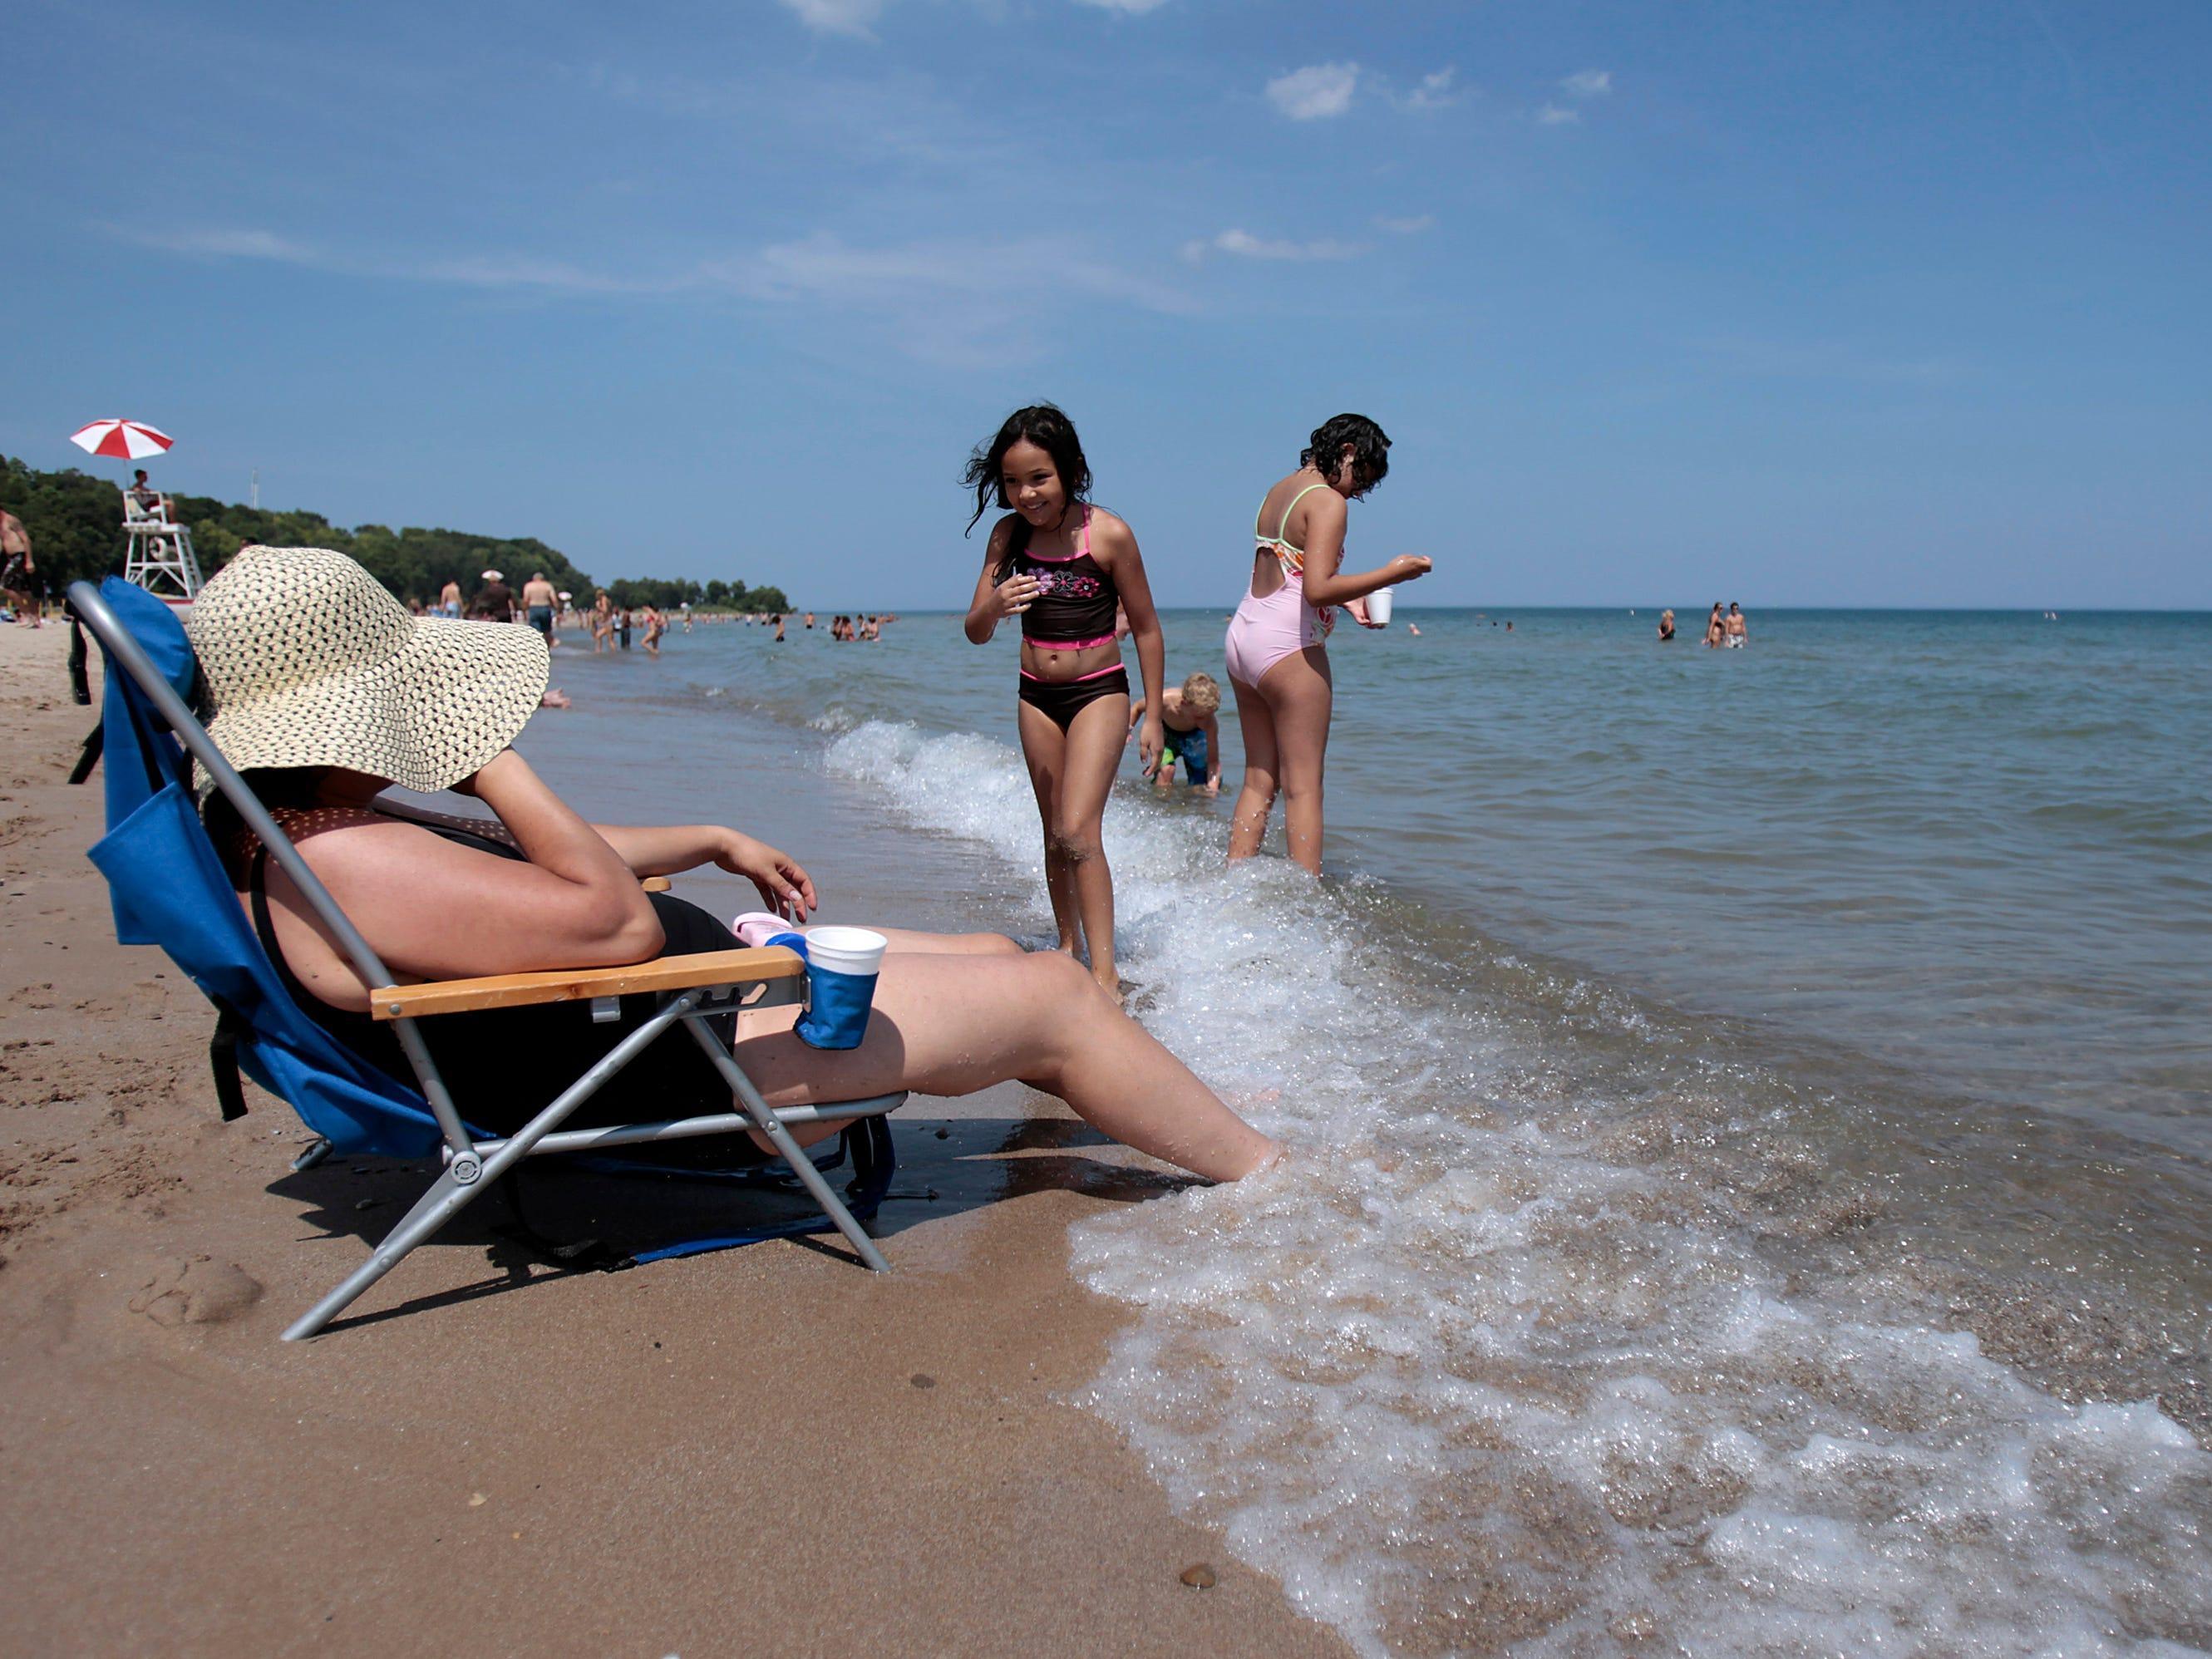 Nadia Elouaski keeps her feet cool at Bradford Beach during a heat wave.